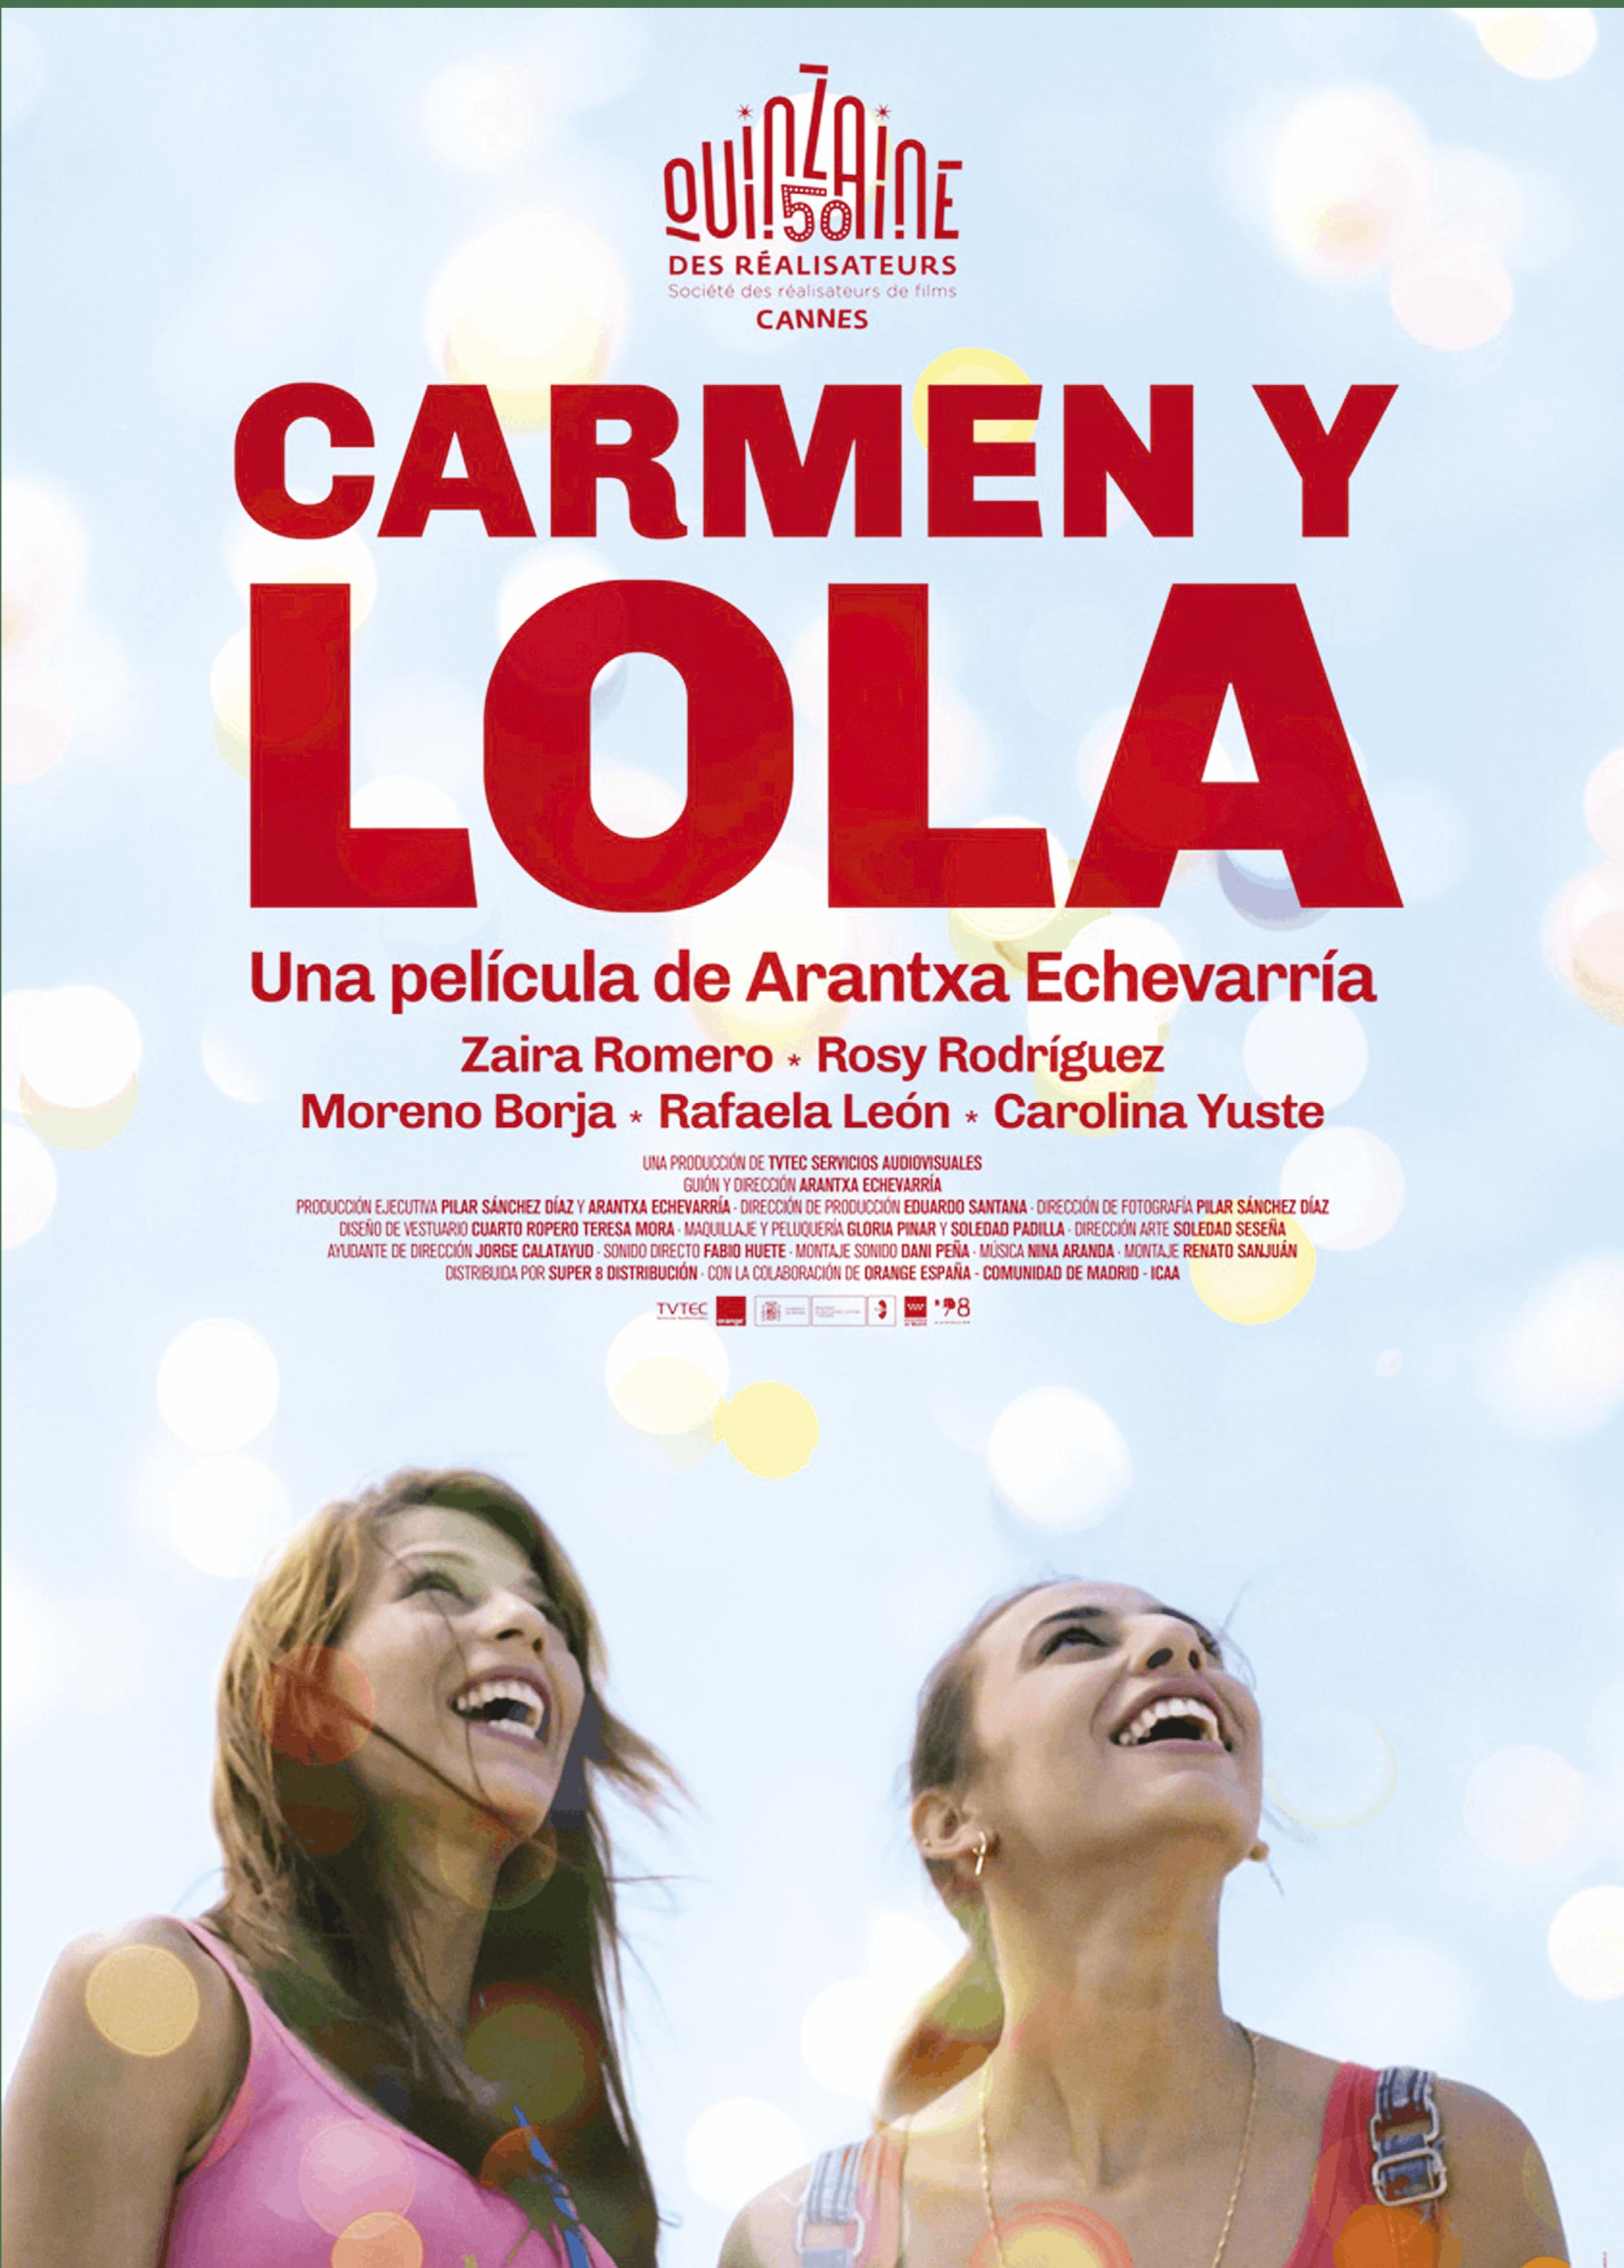 Arantxa Echevarría, Carmen y Lola, 2018